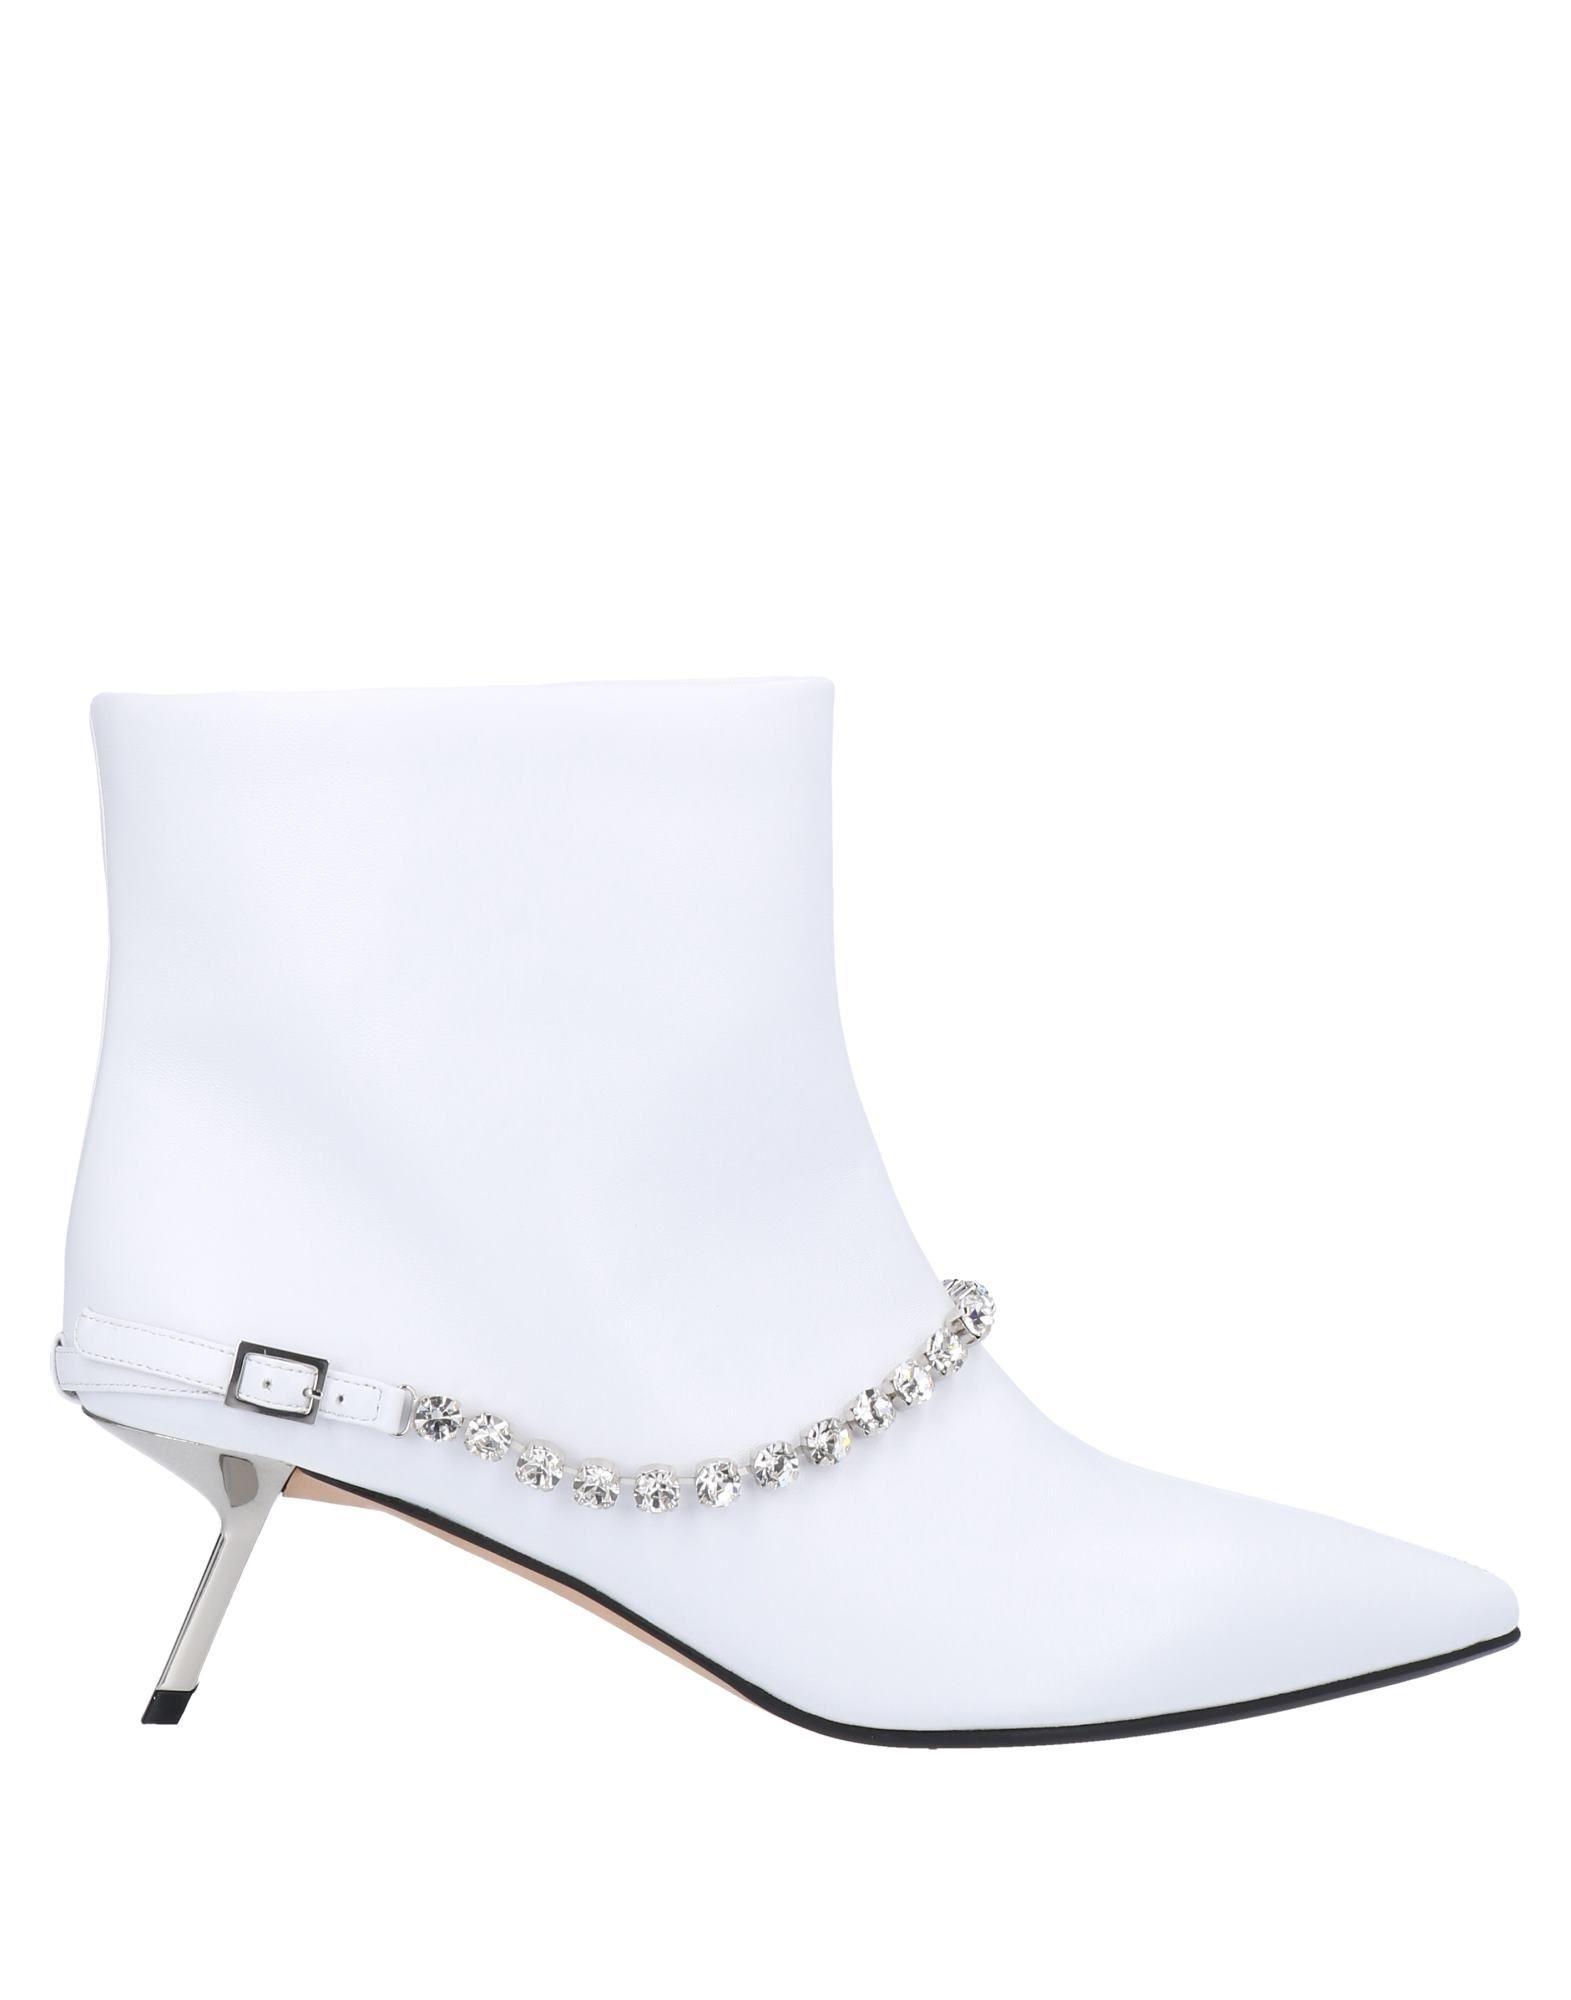 ALCHIMIA DI BALLIN Полусапоги и высокие ботинки фото